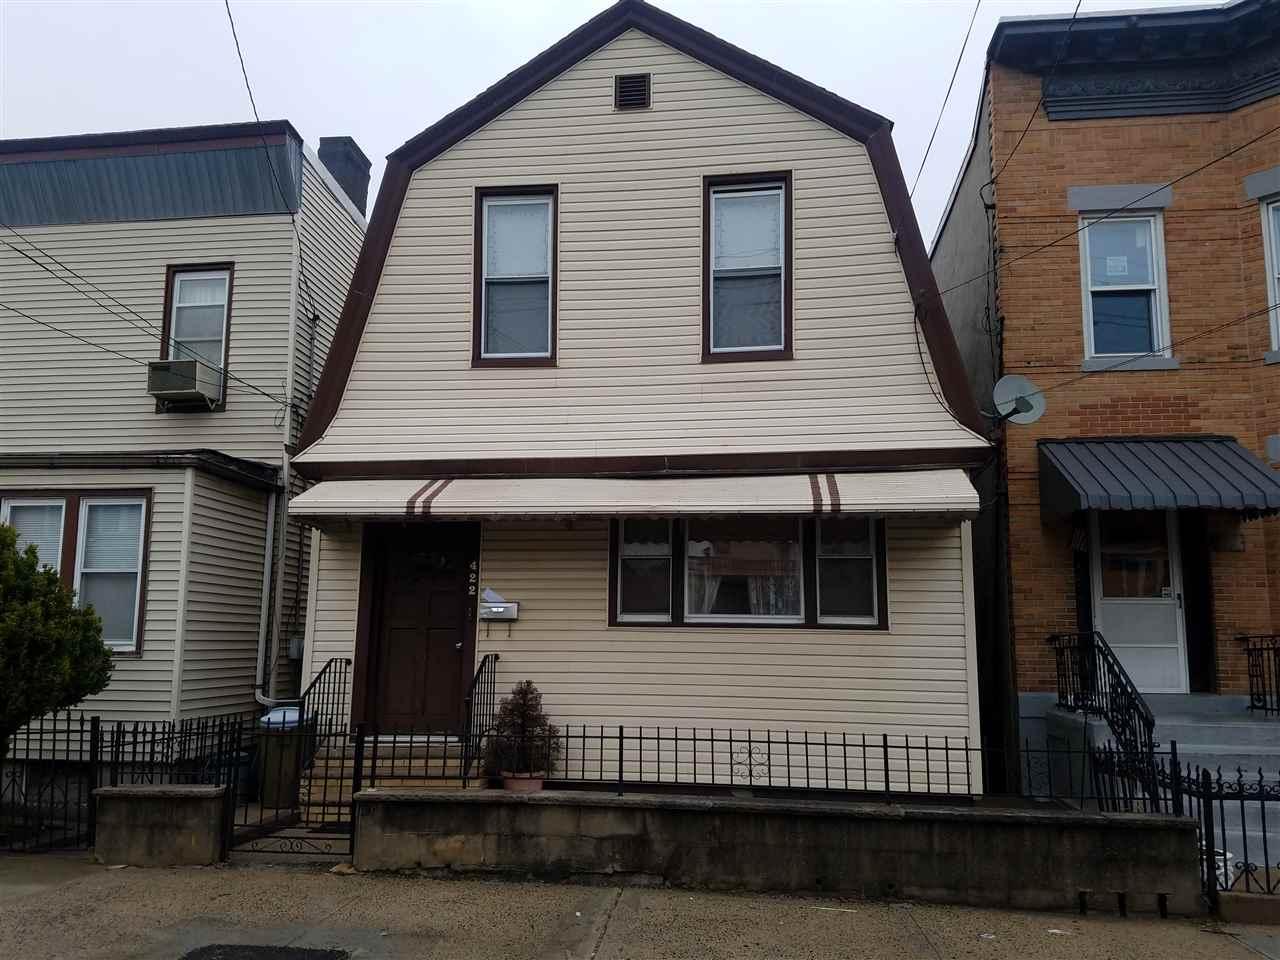 422 71ST ST, North Bergen, NJ 07047